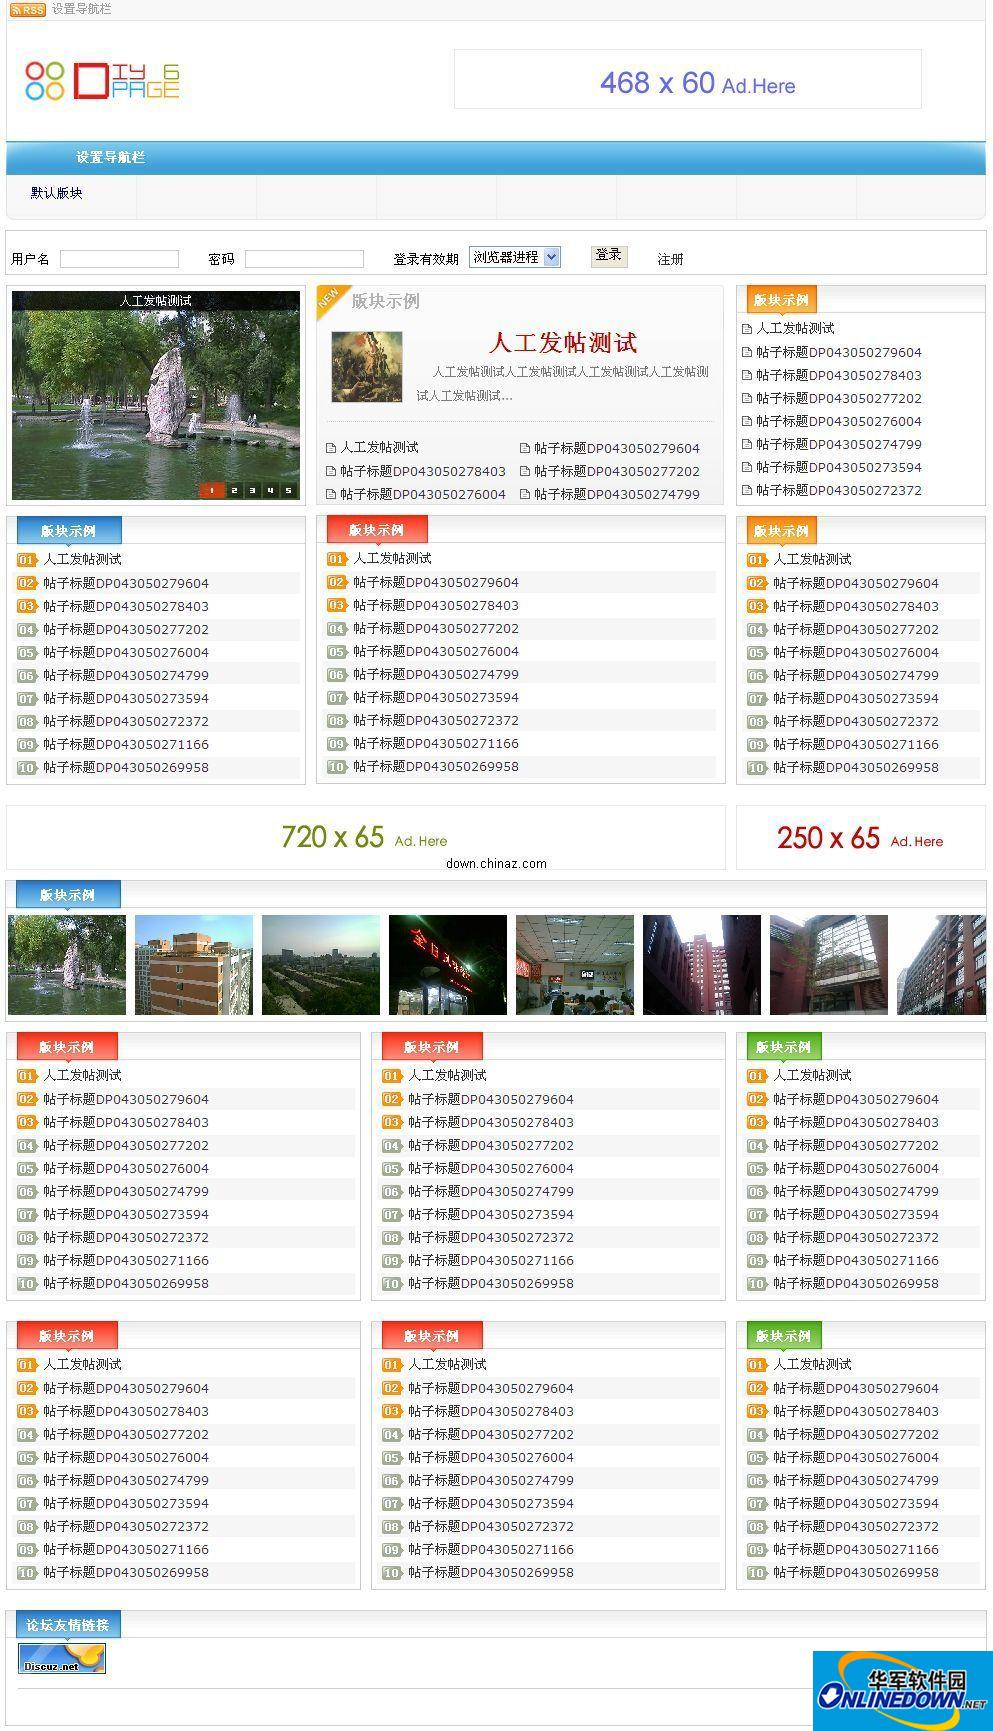 DiY-Page论坛CMS 6.5 build 091029